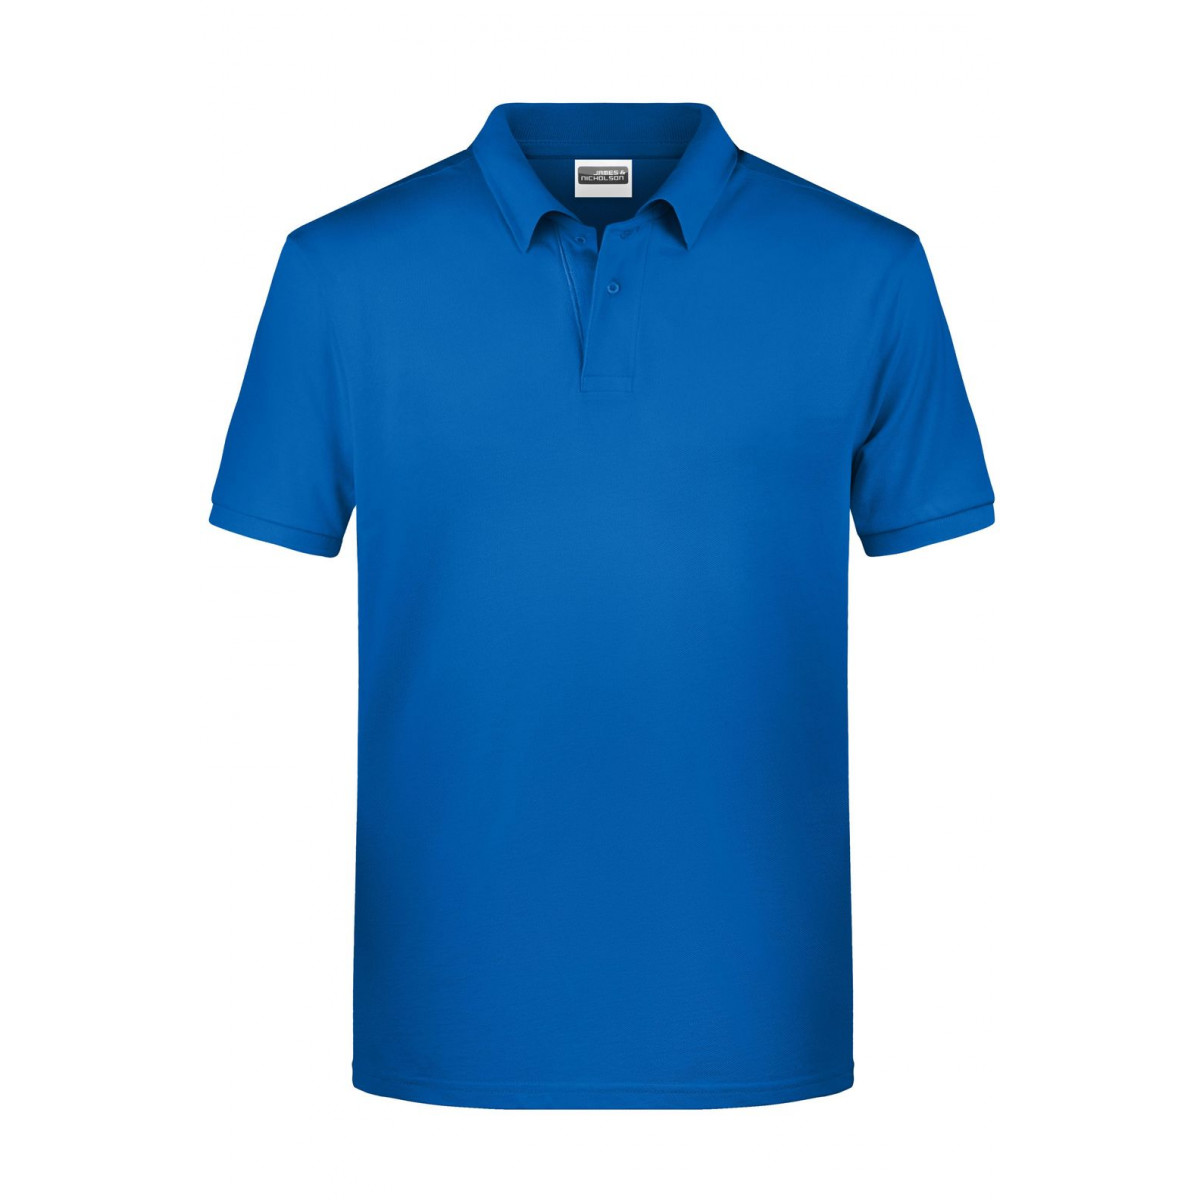 Рубашка поло мужская 8010 Mens Basic Polo - Ярко-синий